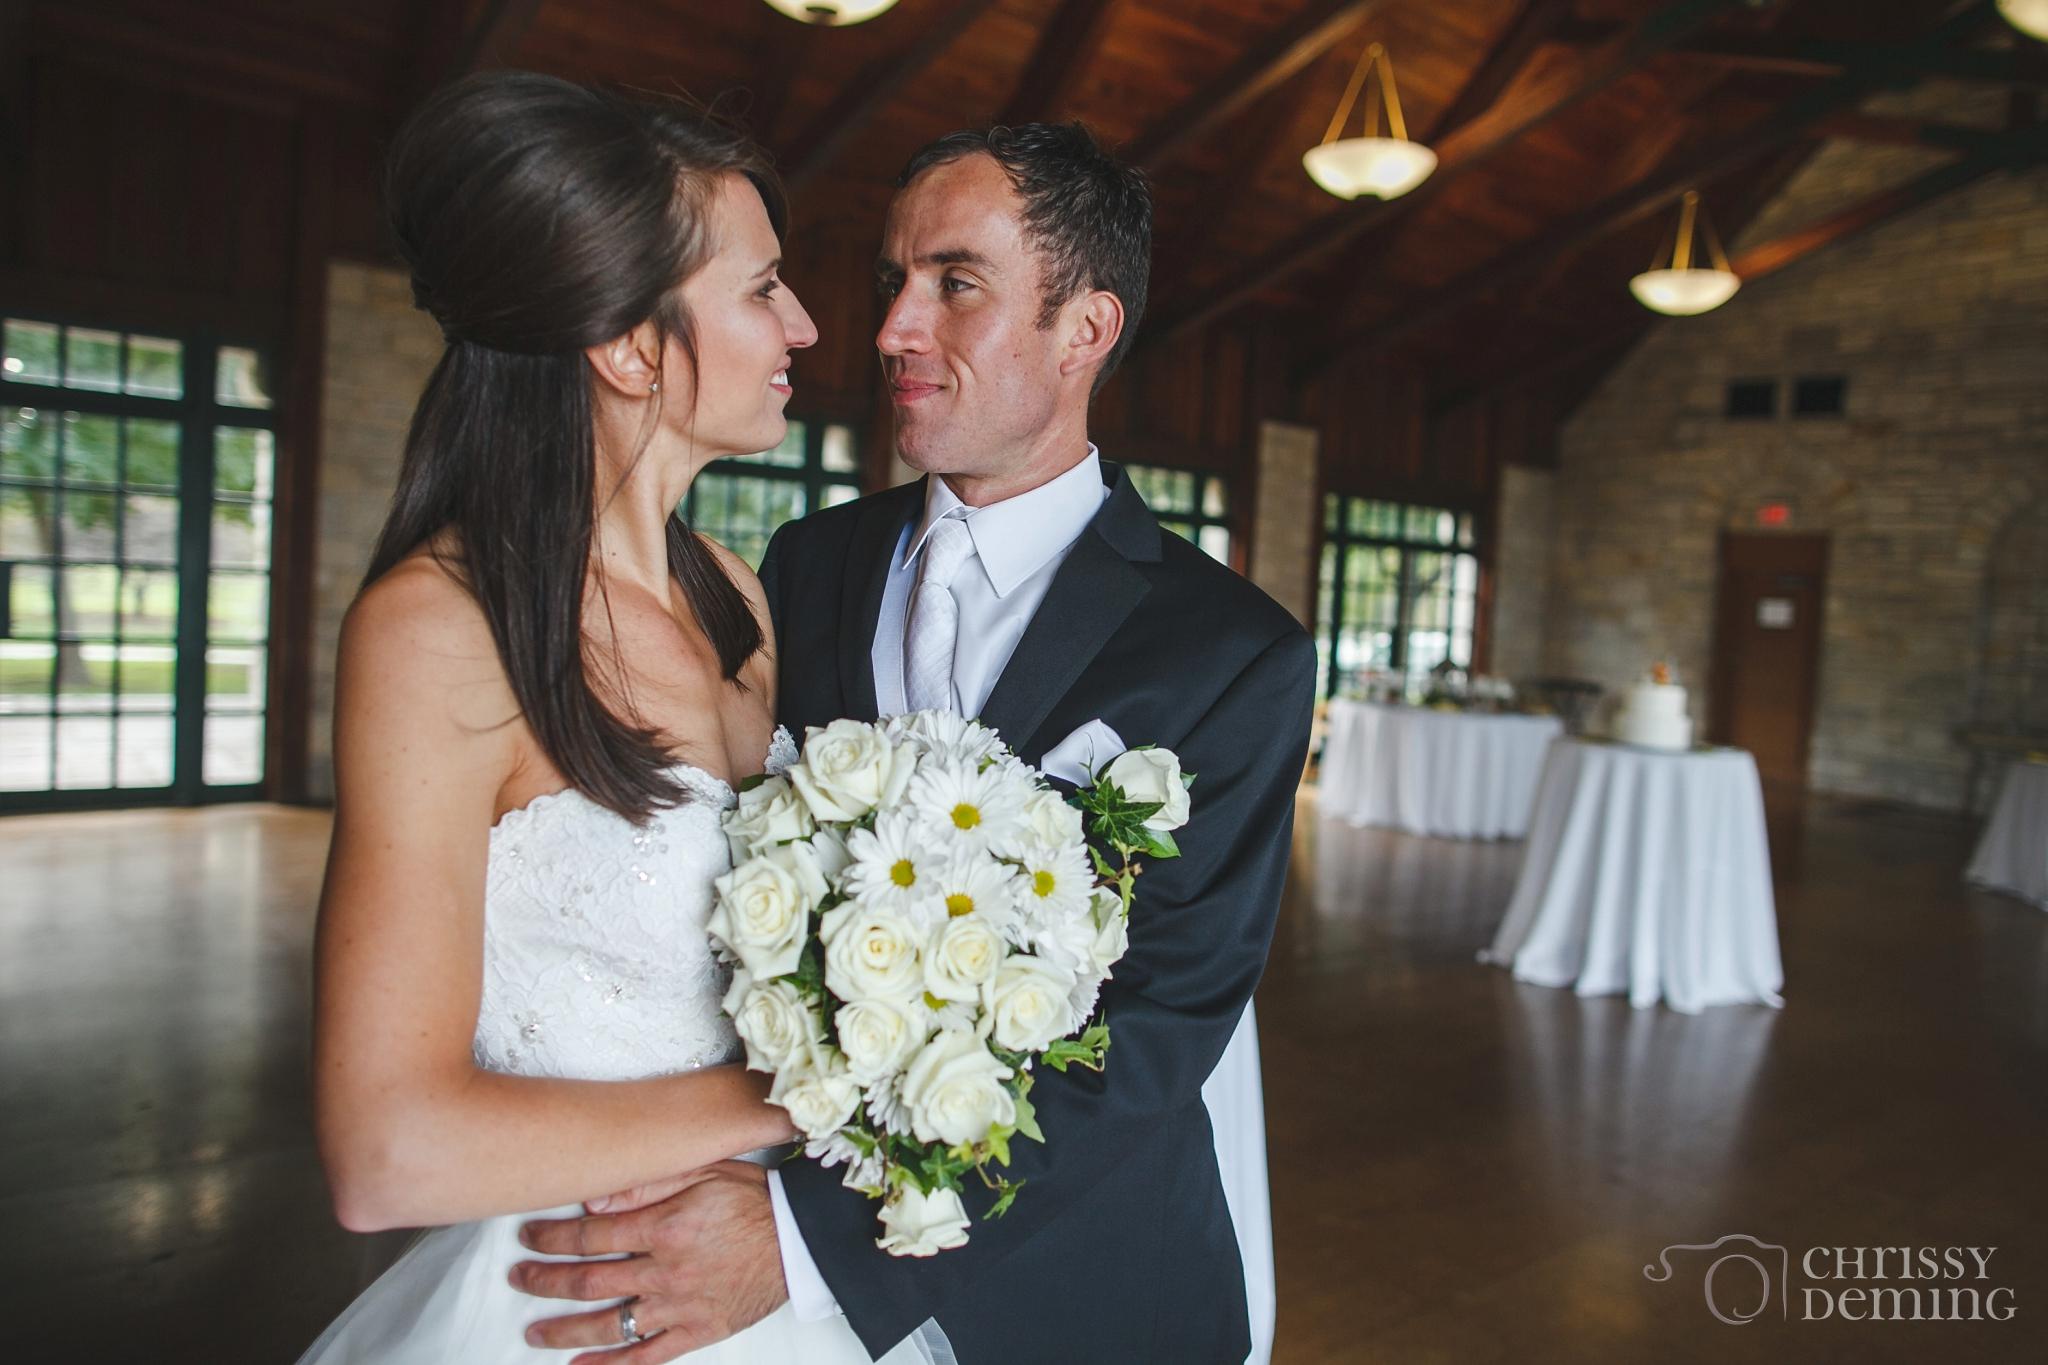 promontory_point_chicago_wedding_photography_0018.jpg